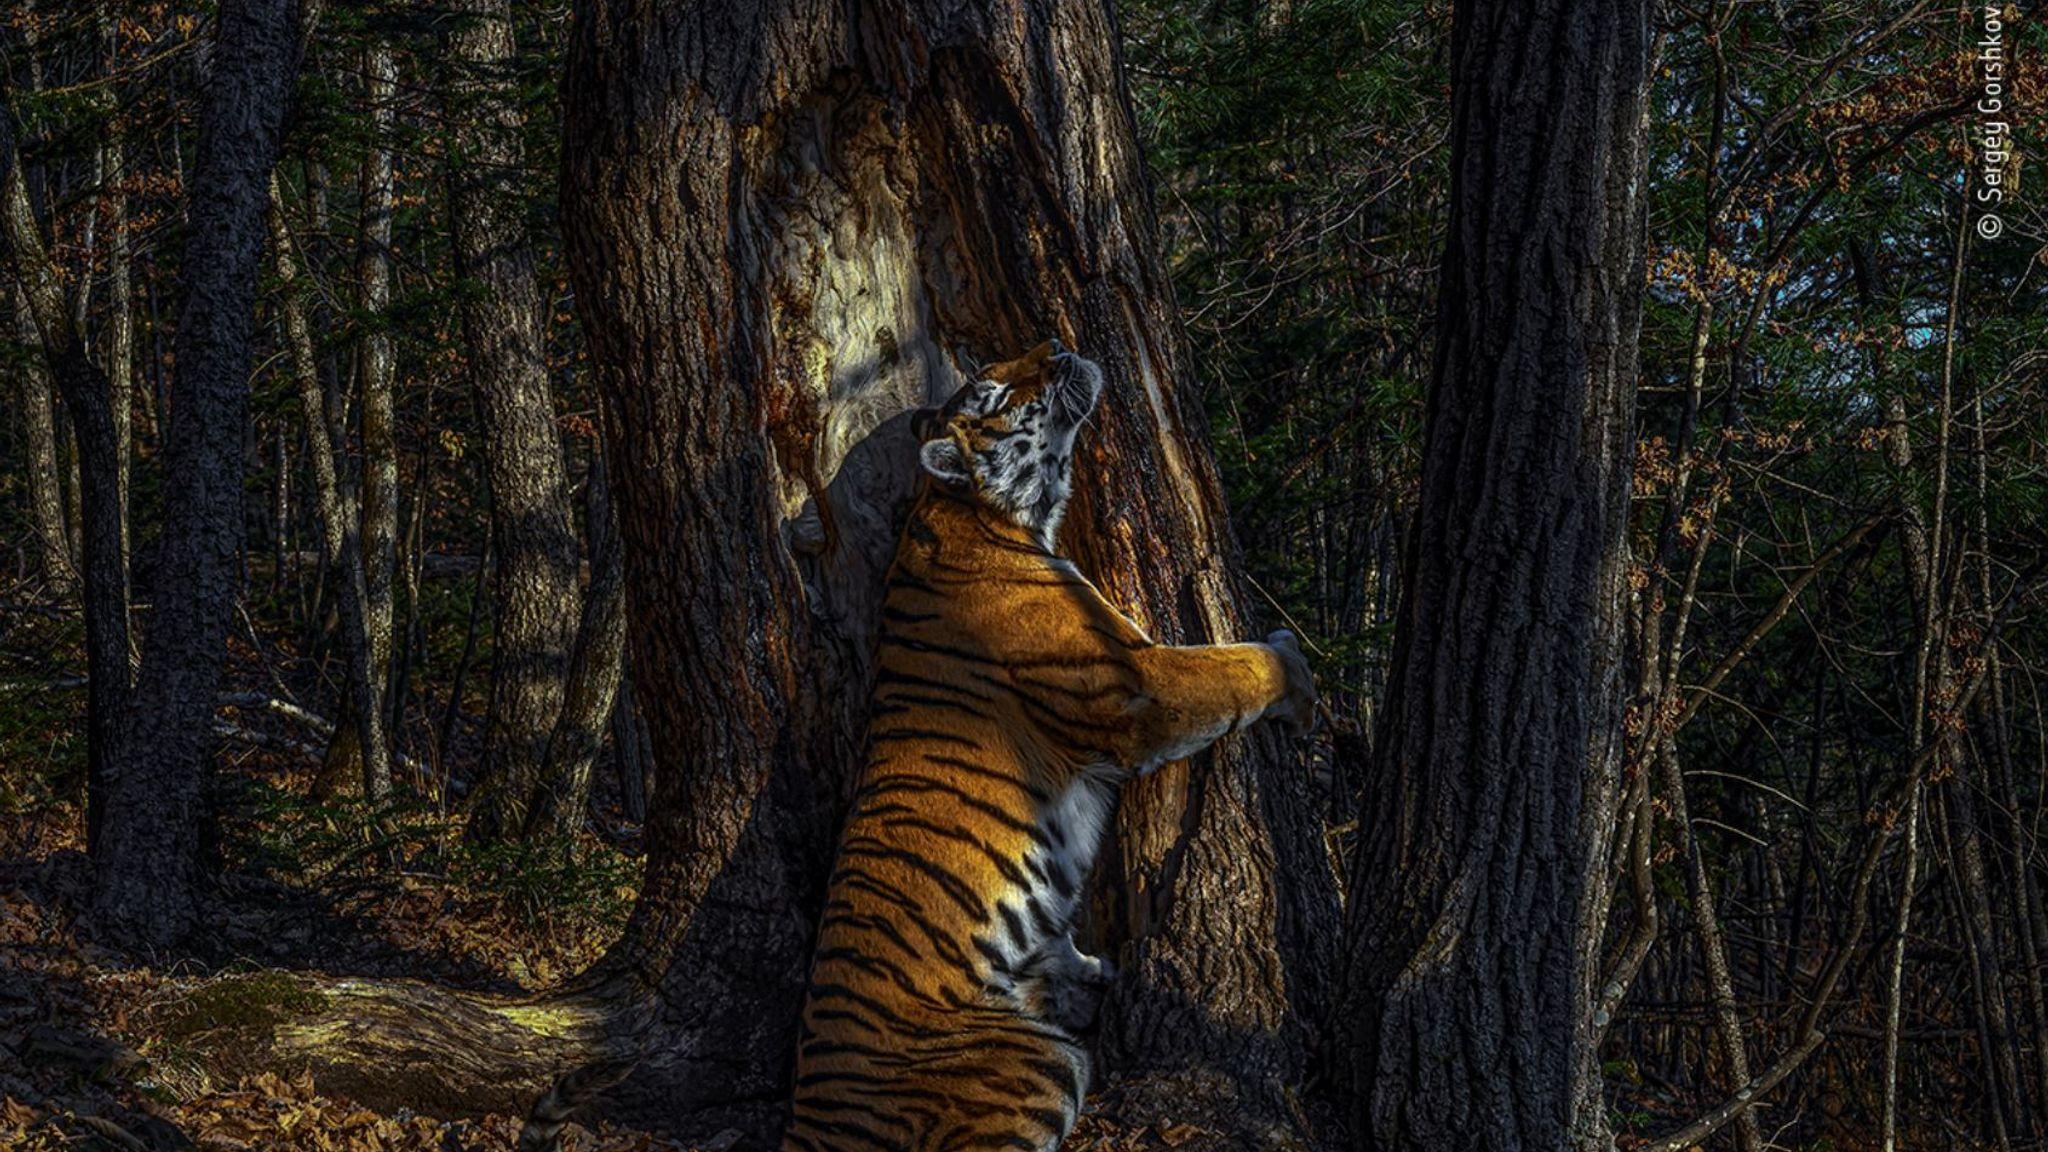 The Embrace, winner of the Wildlife Photographer Of The Year 2020 prize. Pic: Sergey Gorshkov/ Wildlife Photographer Of The Year 2020